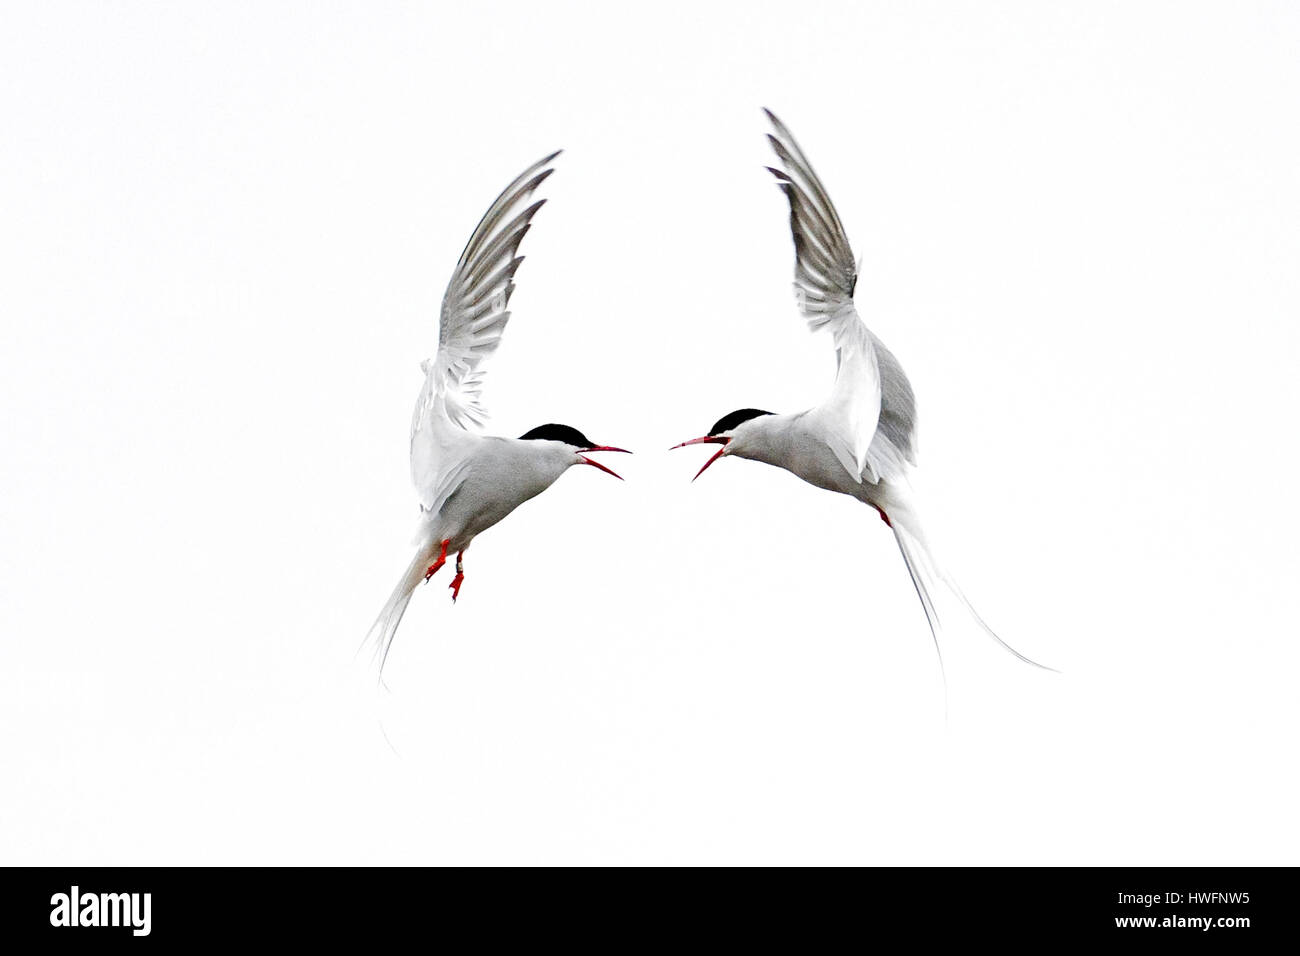 Zwei kaempfende Flussseeschwalben, Two arctic terns (Sterna paradisaea) fighting. - Stock Image